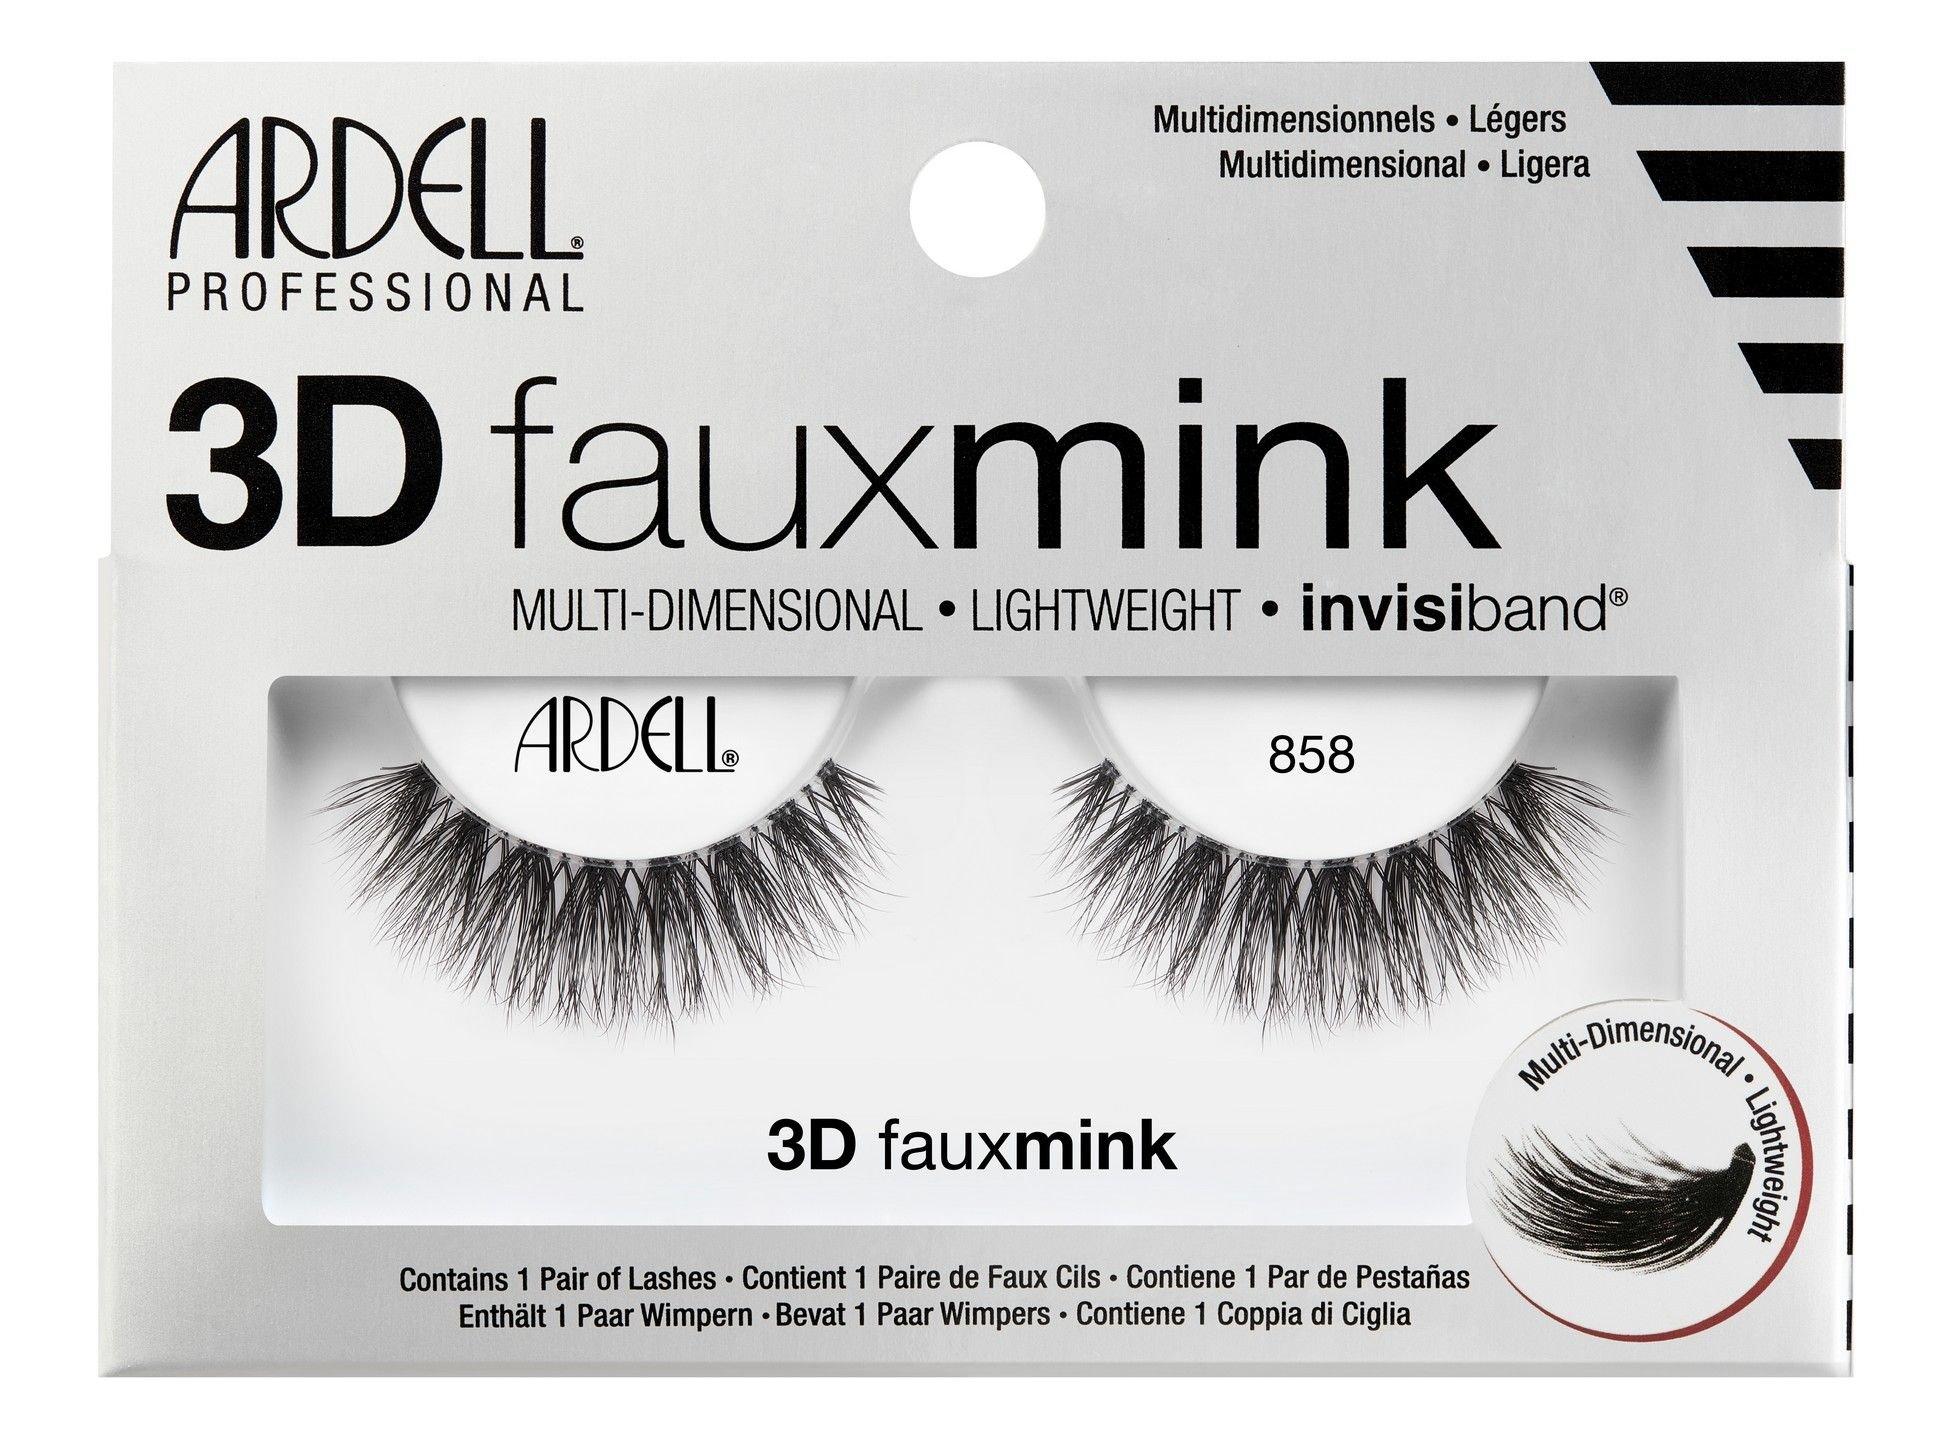 Ardell 3D Faux Mink False Eyelashes 1ml Black